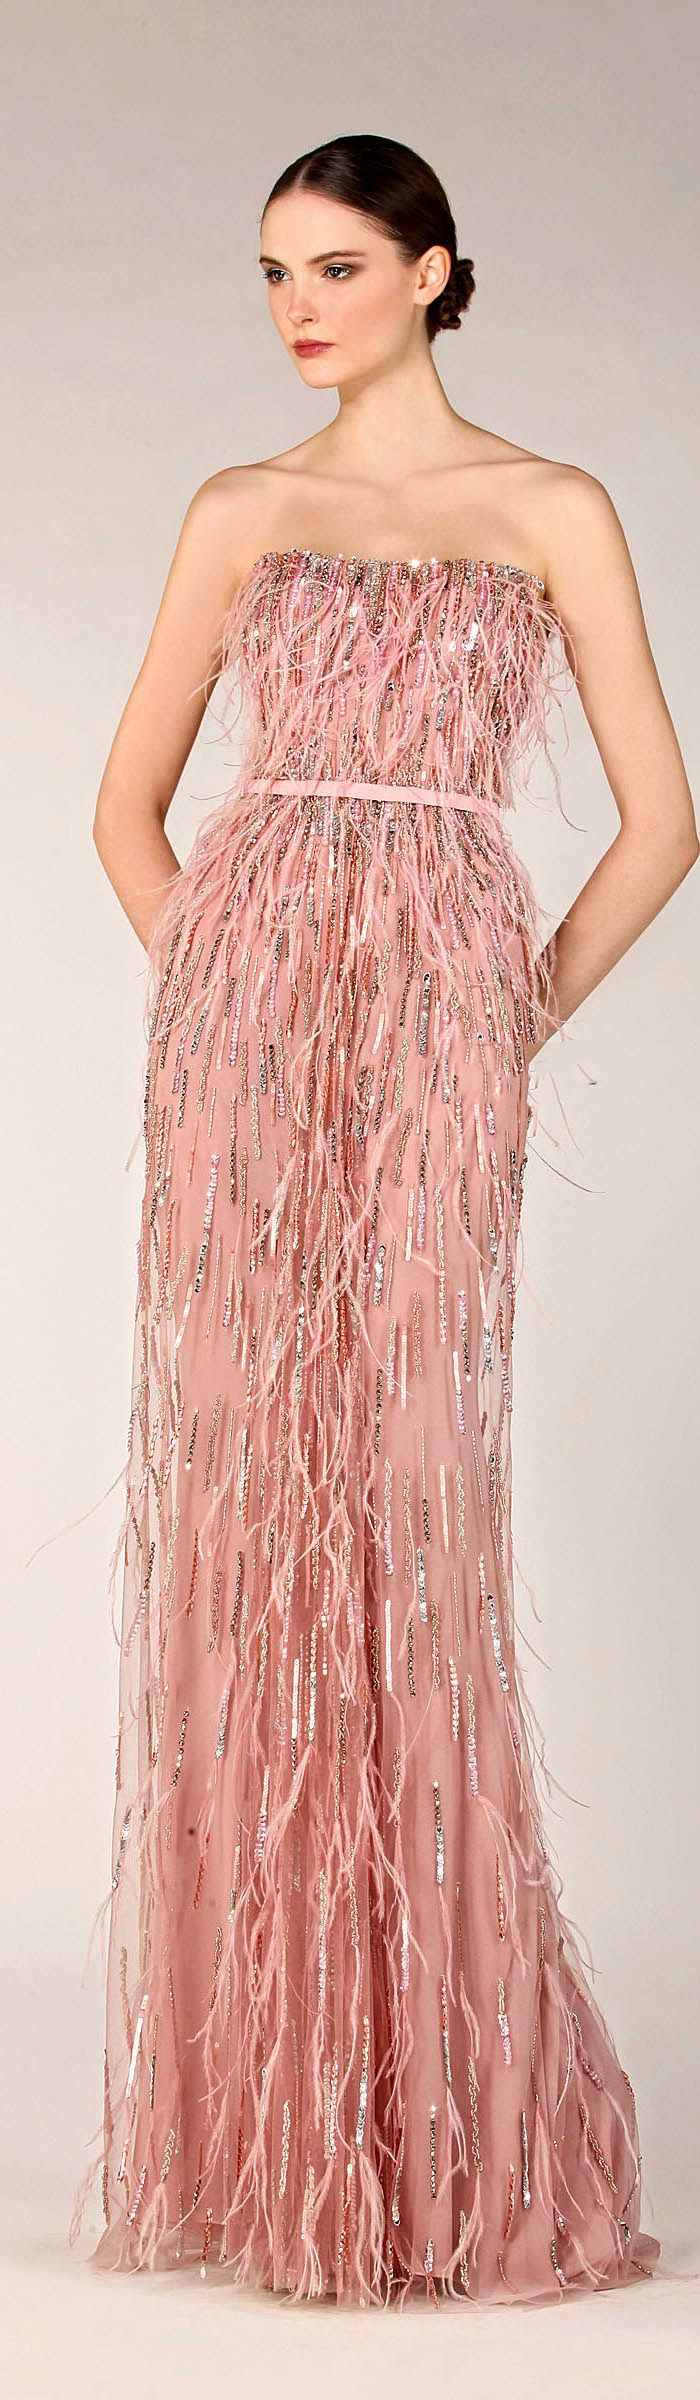 331 best Vestidos elegantes. images on Pinterest   Elegant dresses ...